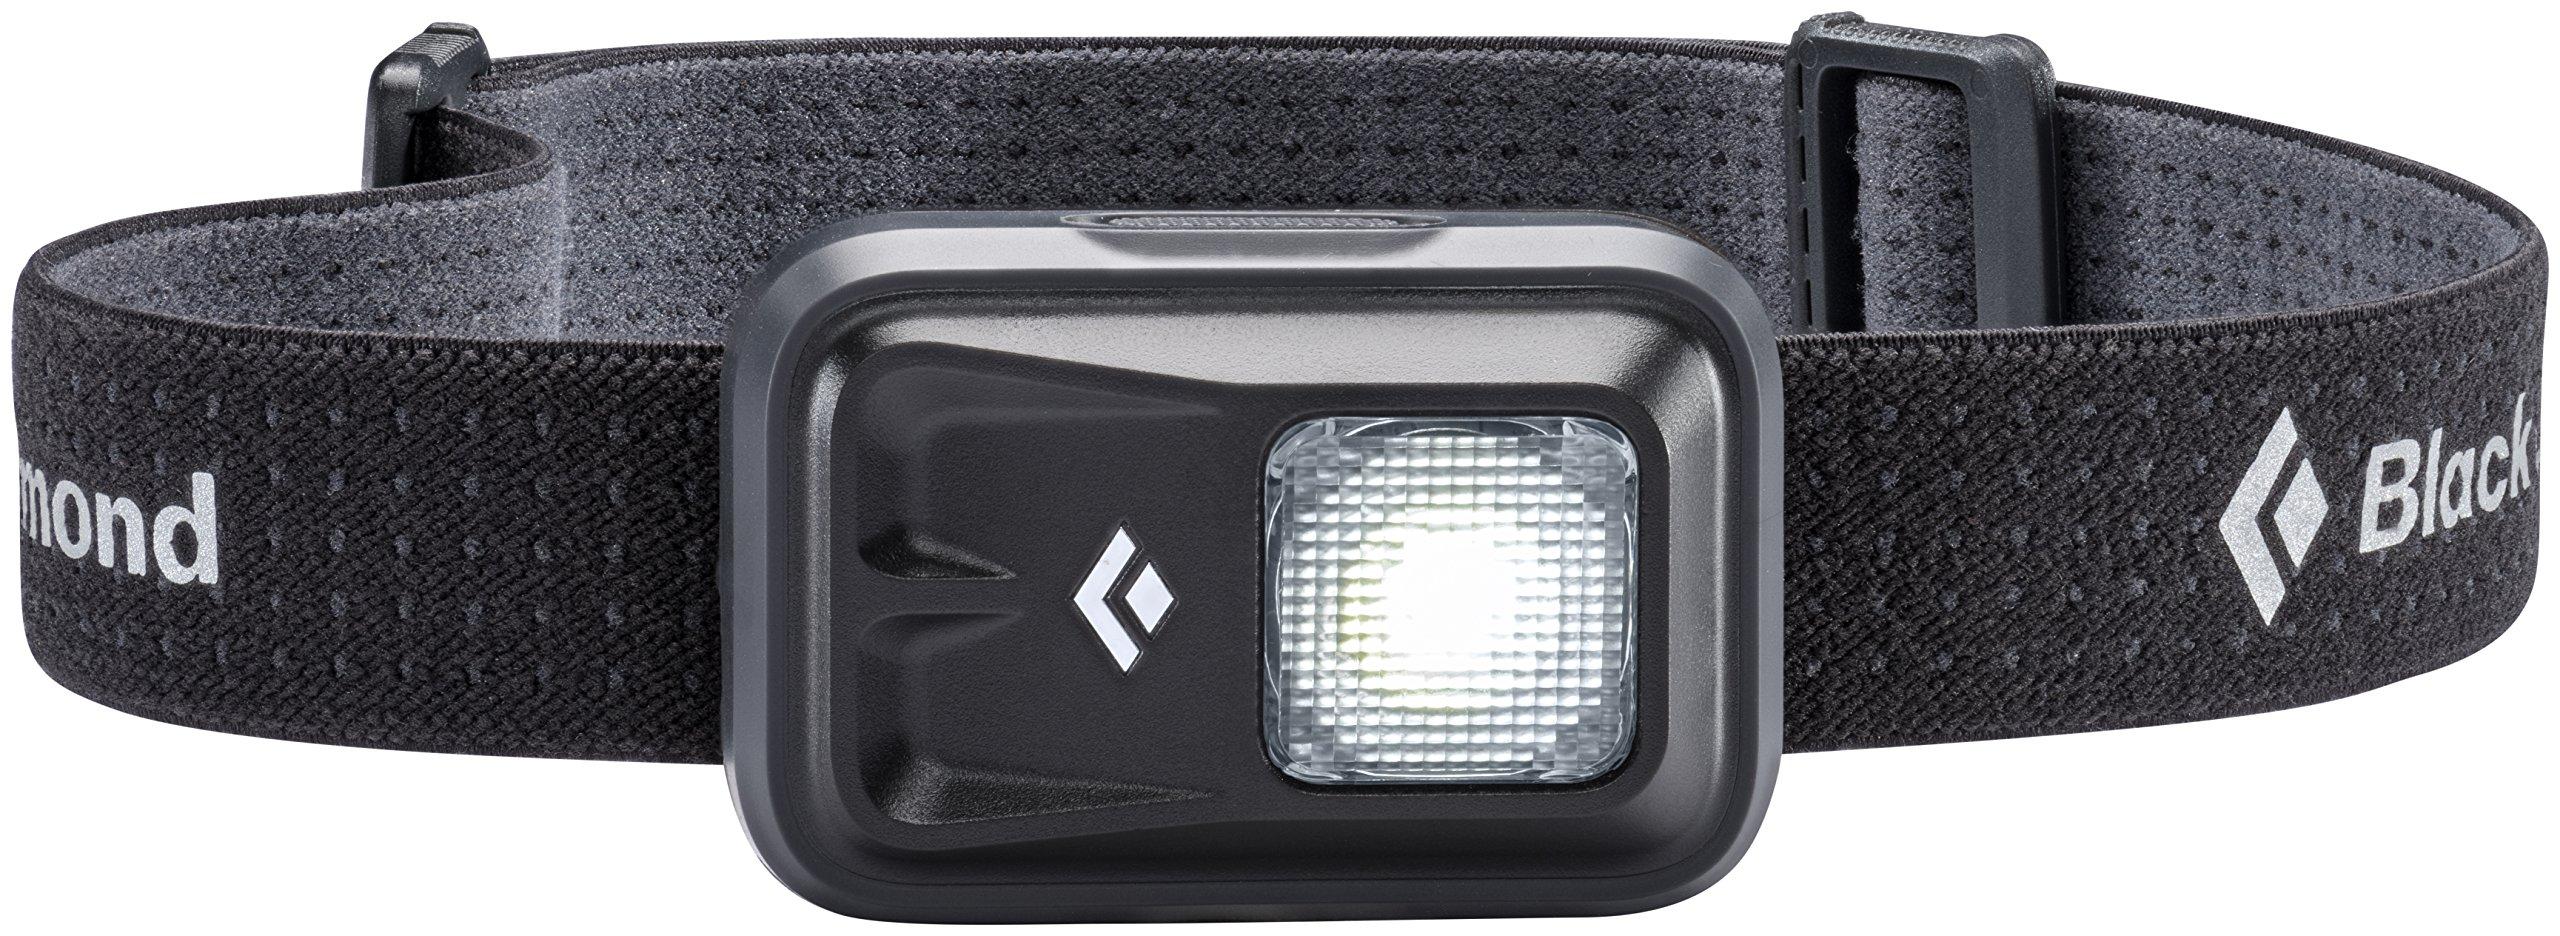 Black Diamond Astro Headlamp, Black, One Size